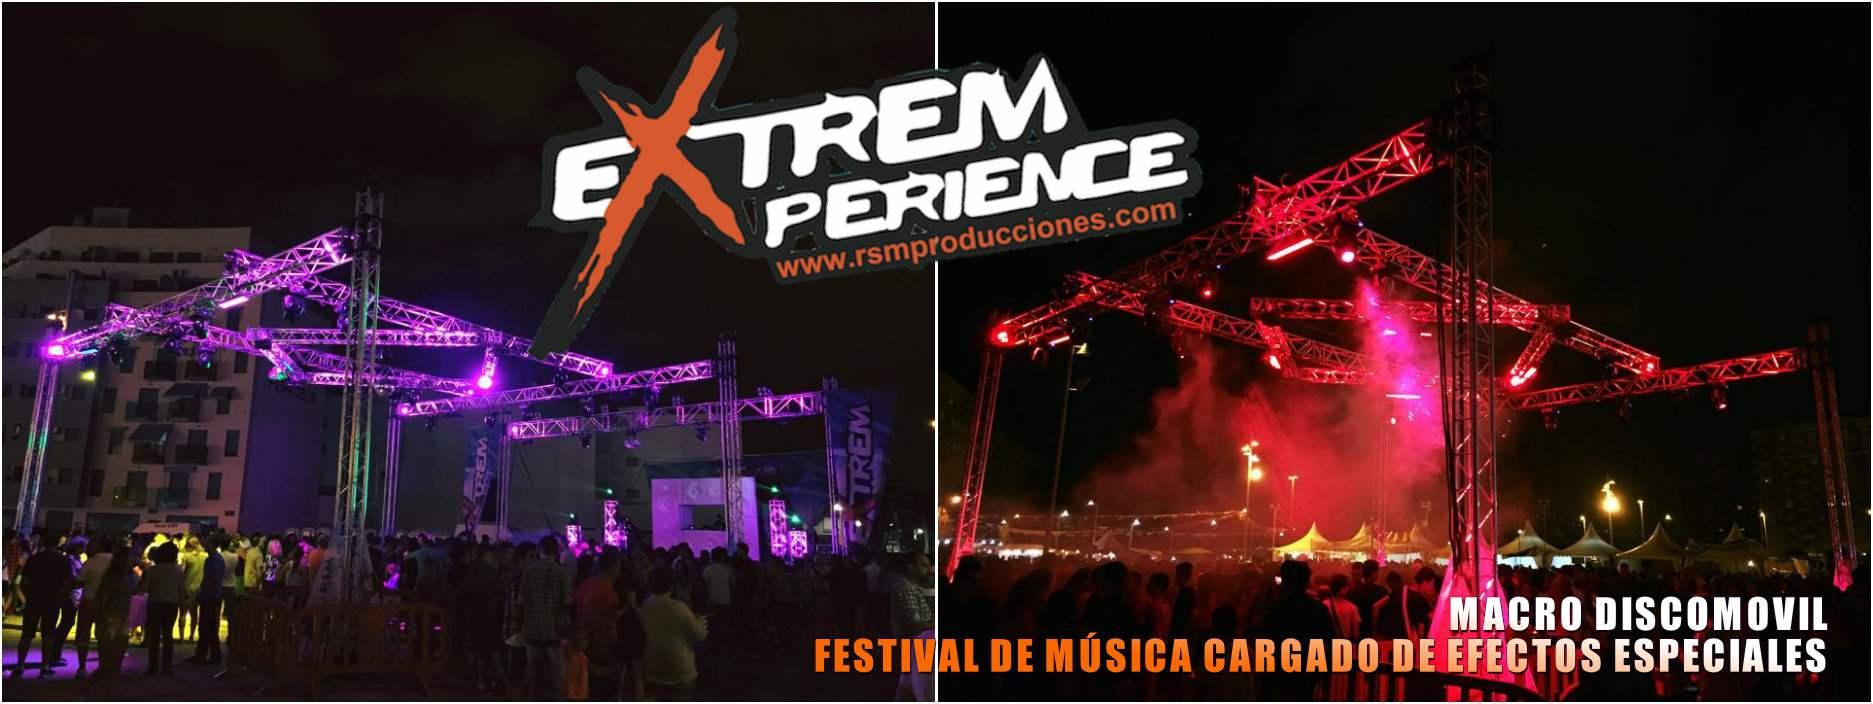 macro extrem experience fx mislata 2015